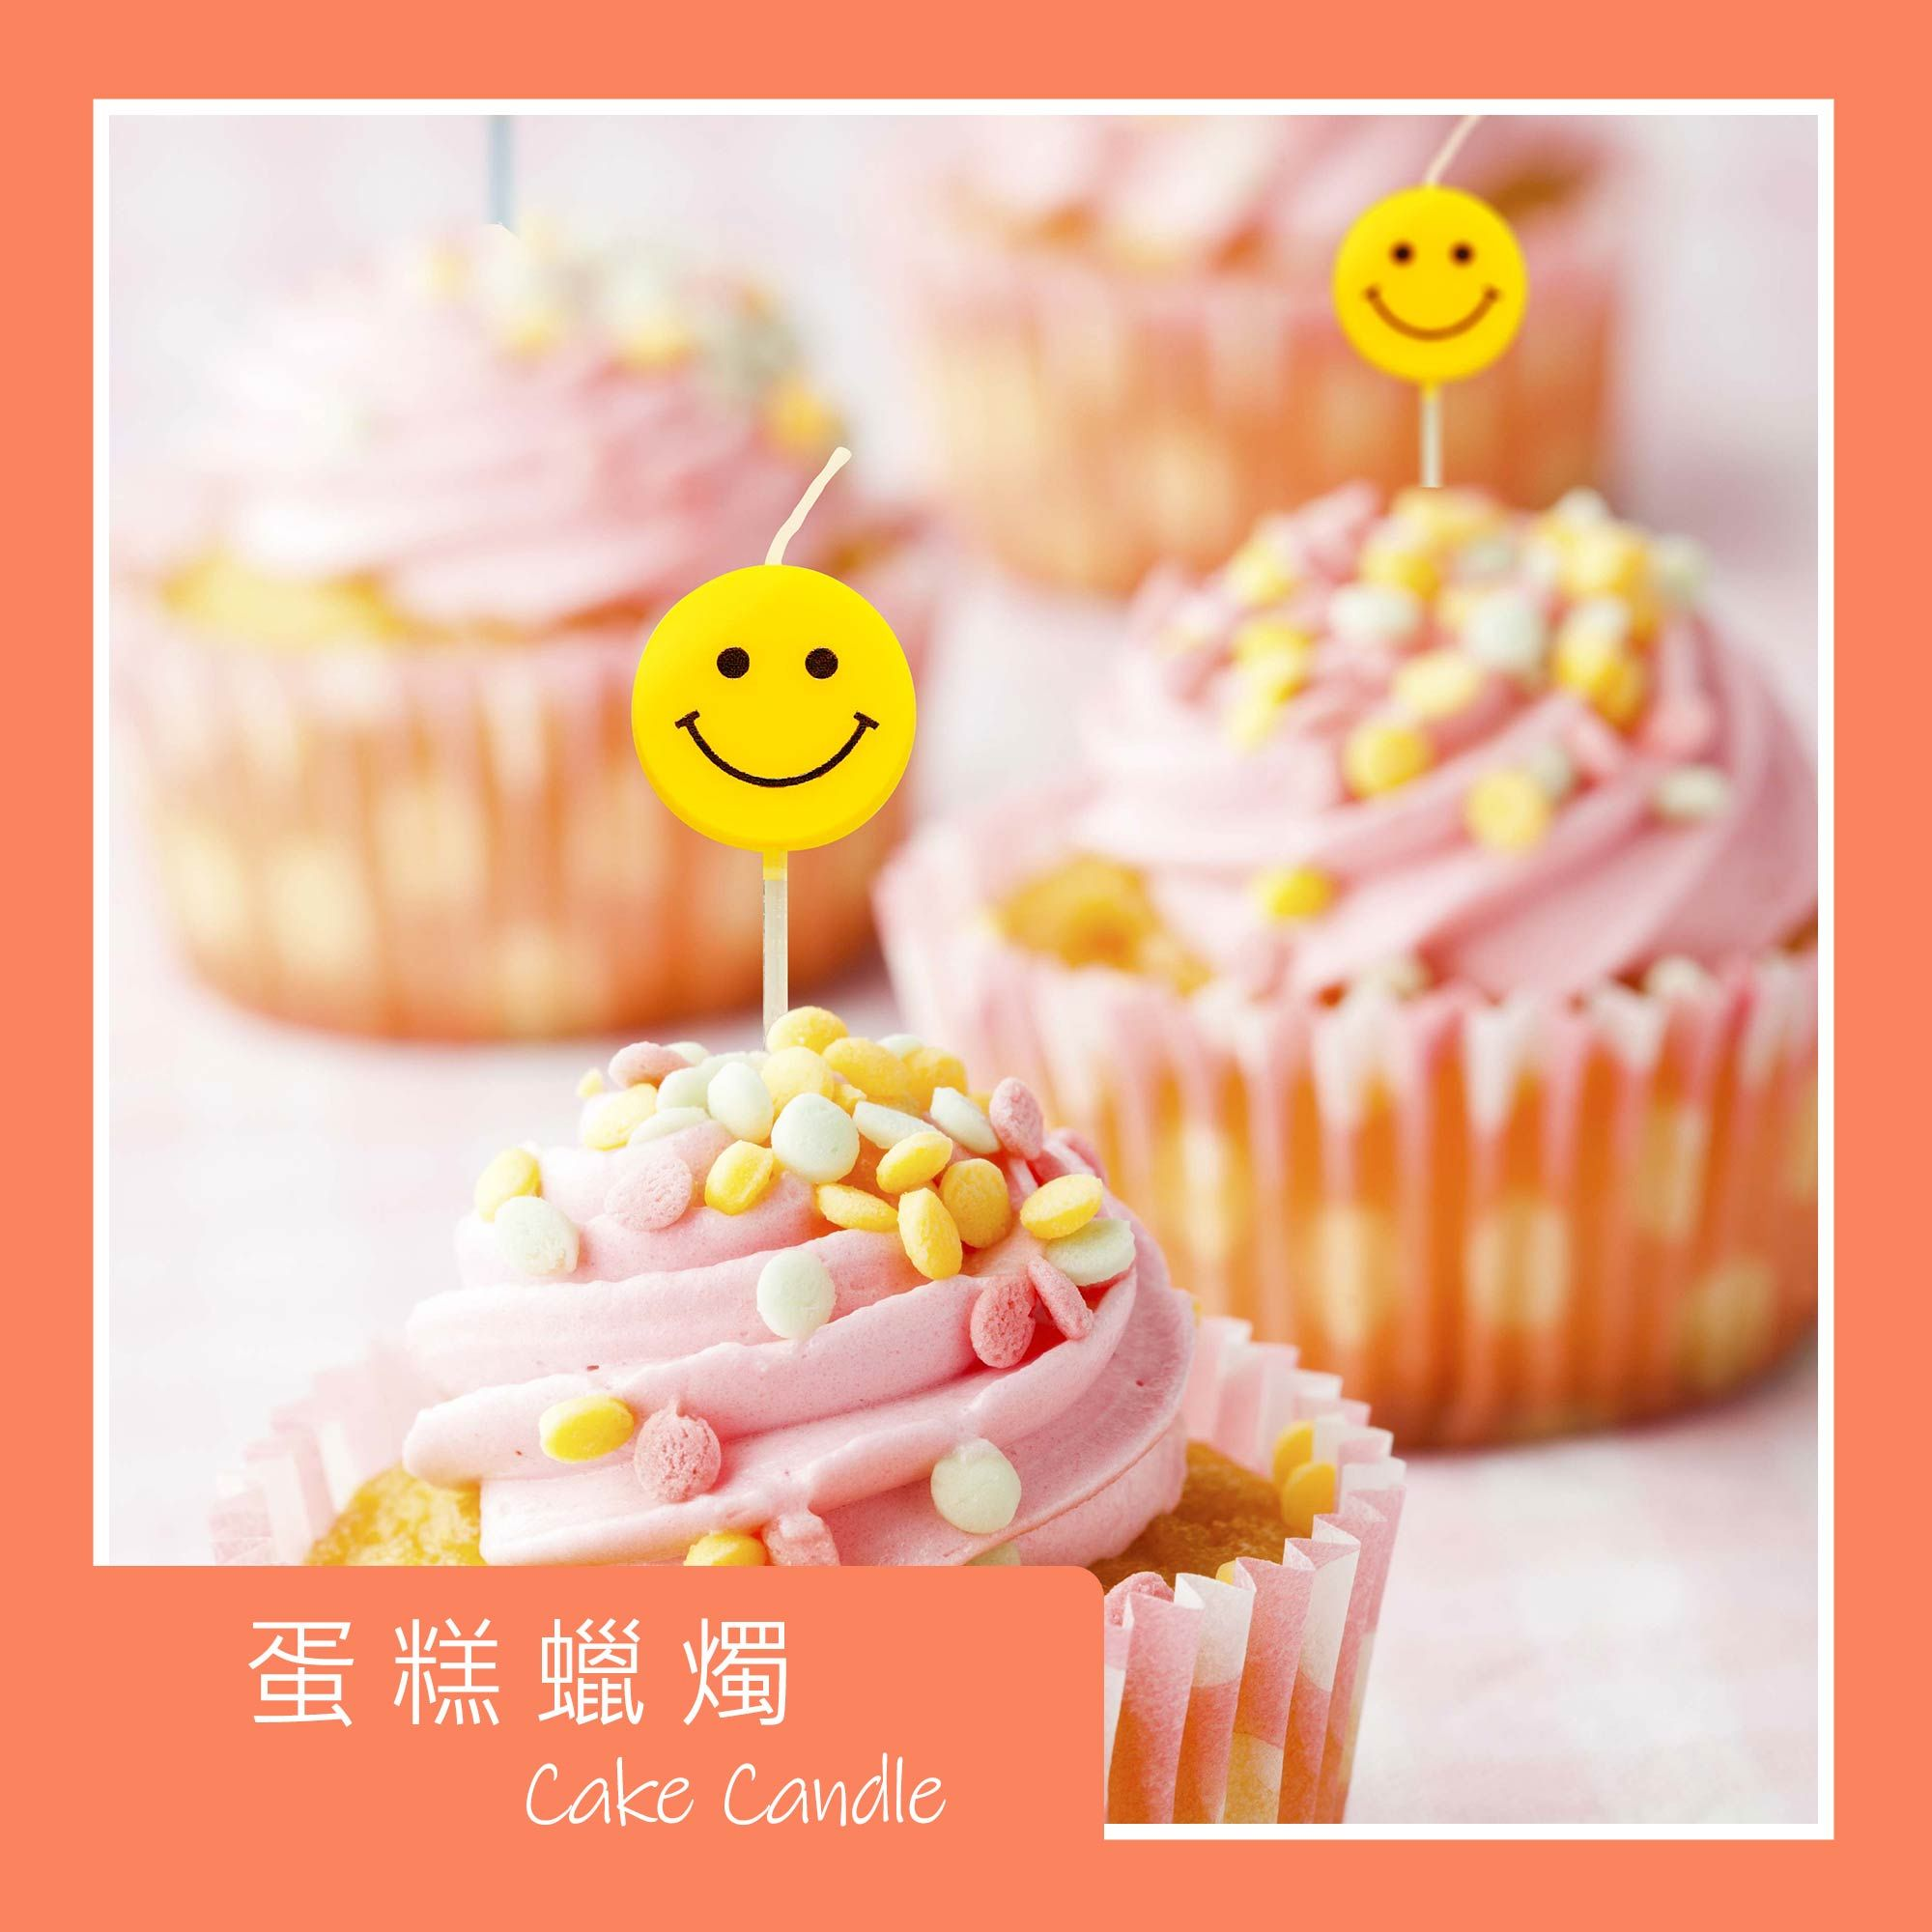 Cake Candle - Tair Chu cake candle